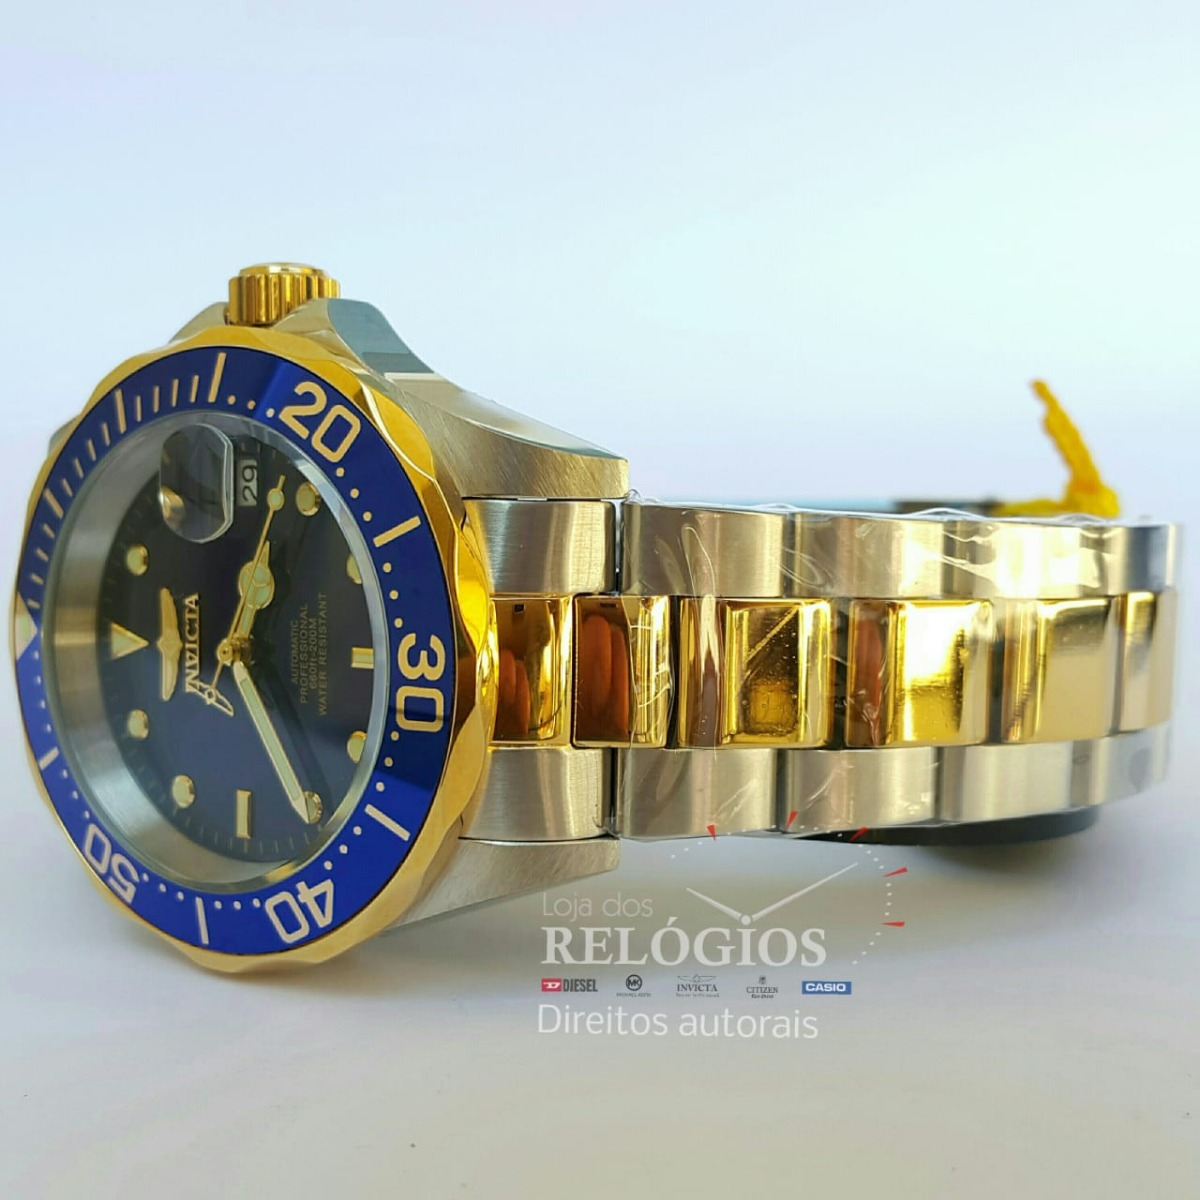 9a010640c1d relógio invicta pro diver mod 8928 original preto rolex. Carregando zoom.